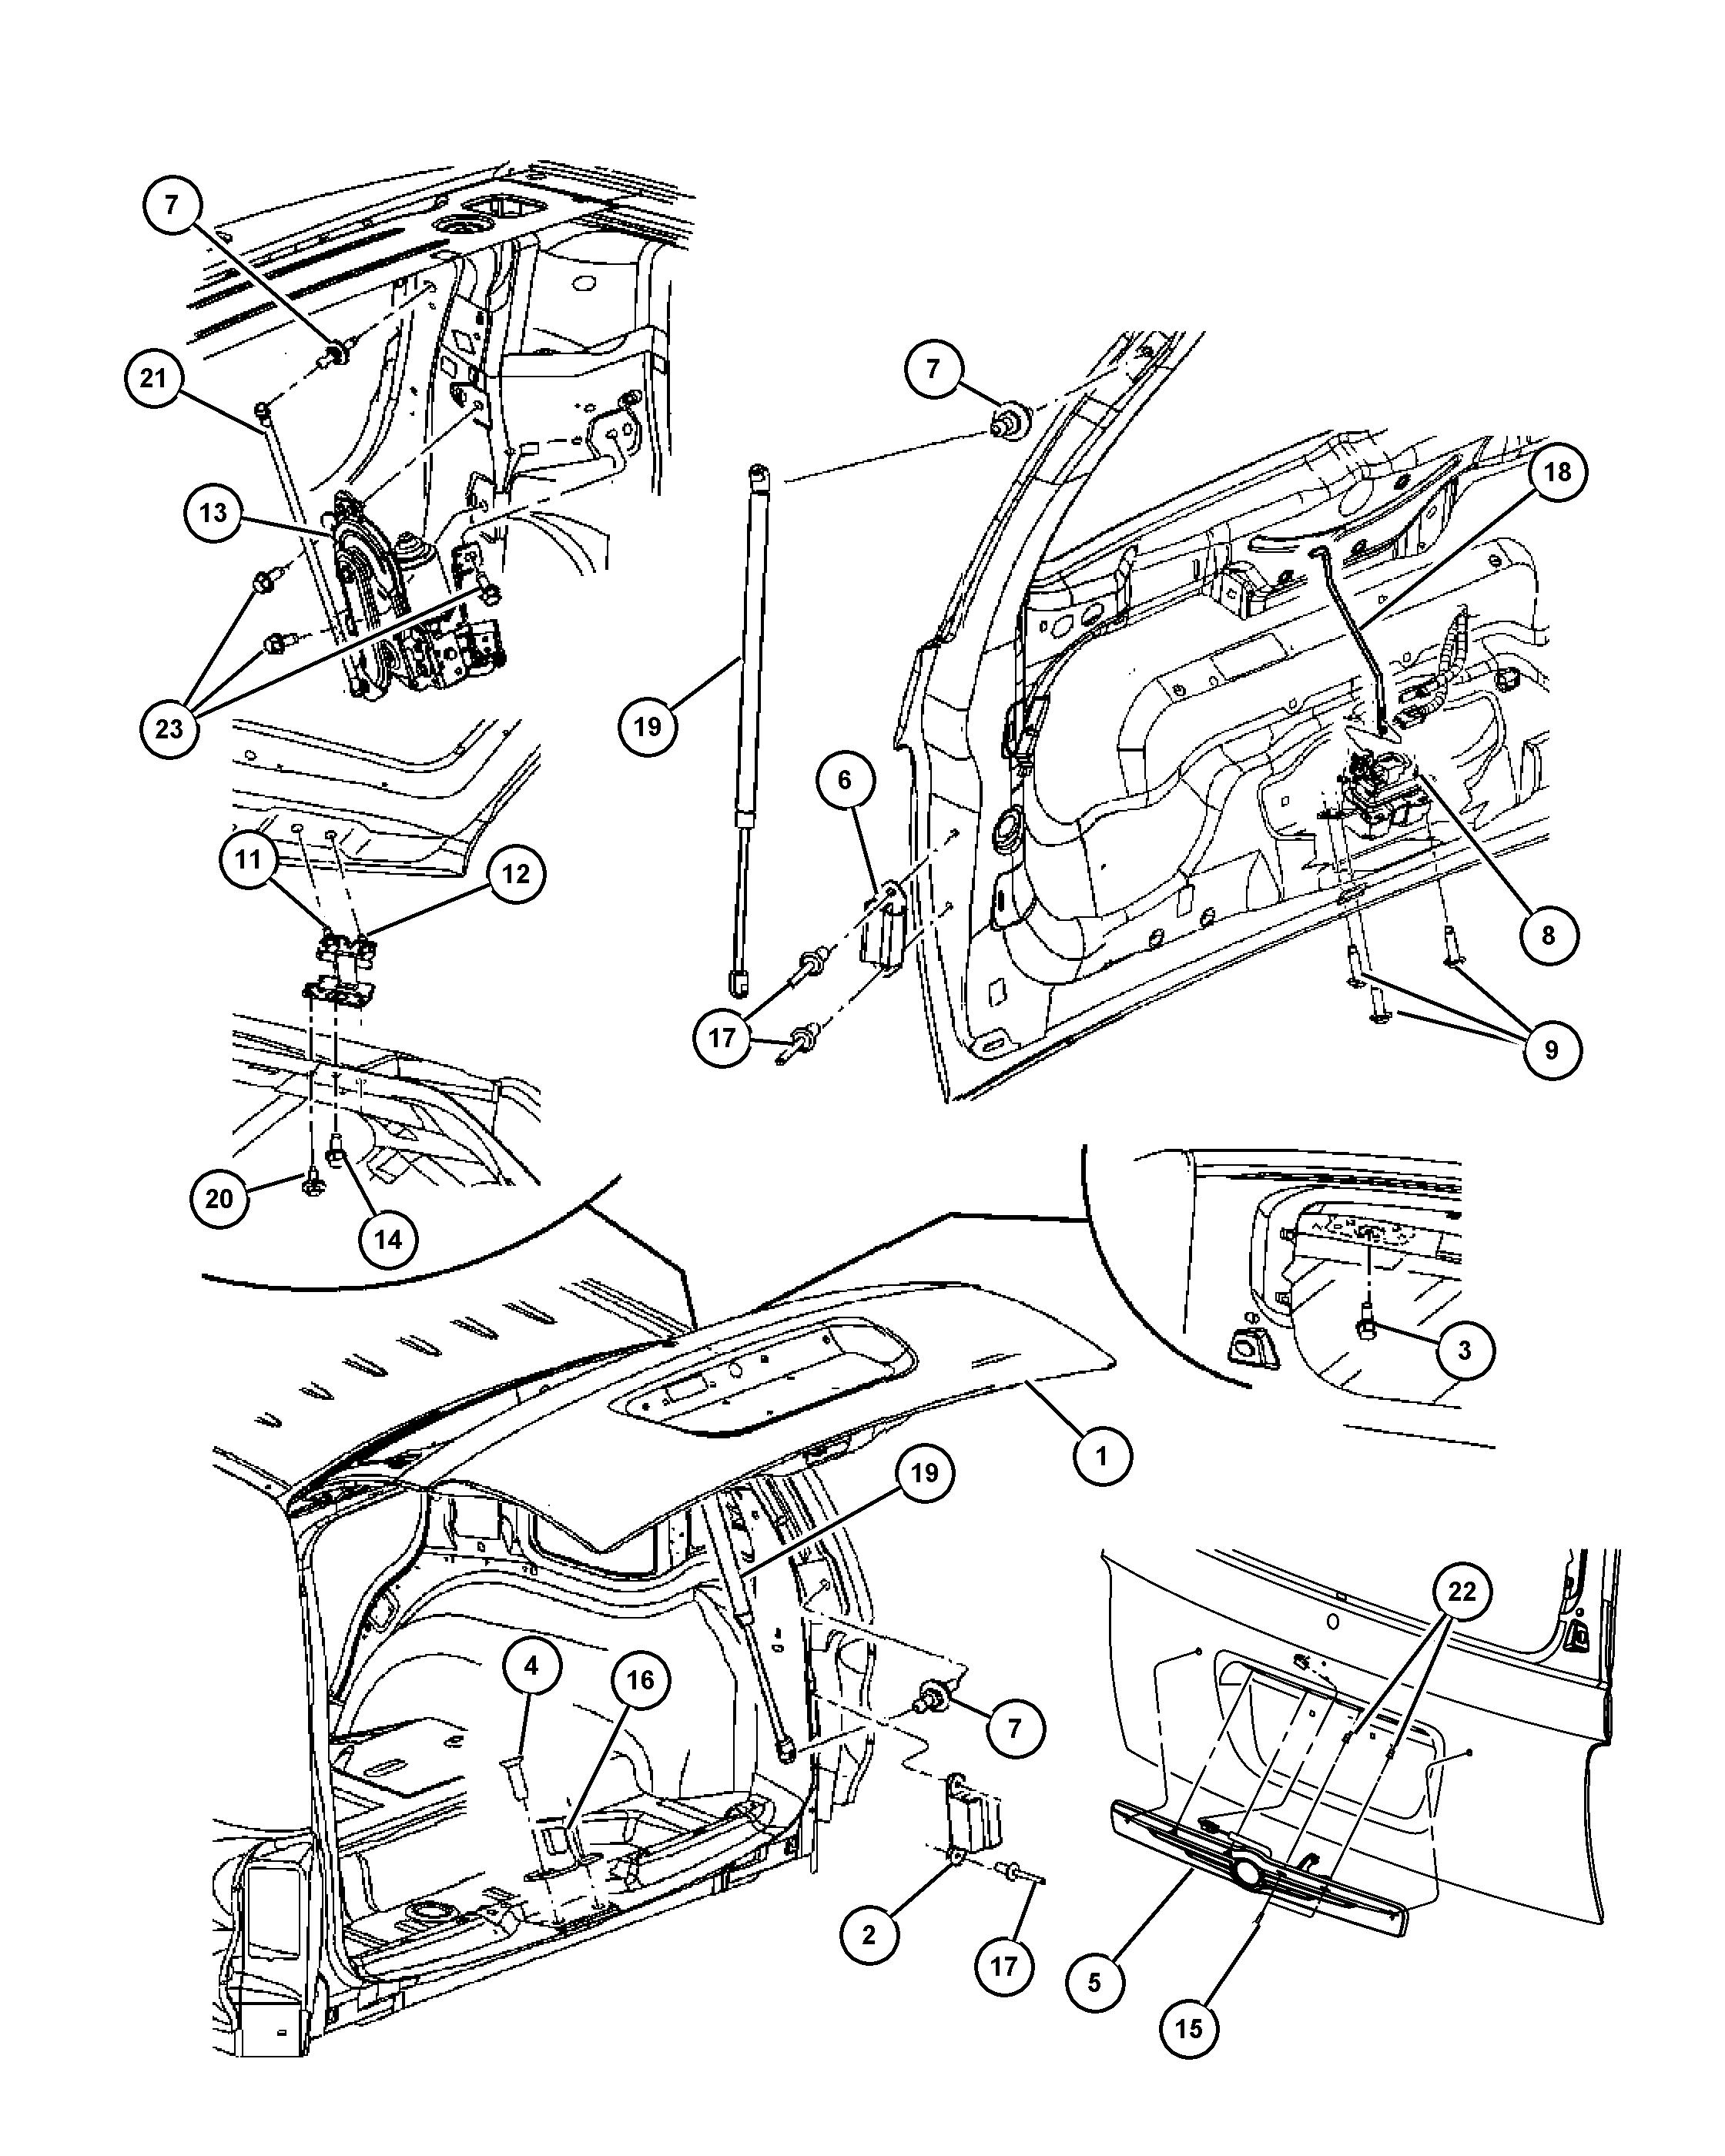 gmc suv wiring diagram databasedodge suv wiring diagram database gmc canyon dodge suv wiring diagram database dodge lowrider dodge durango